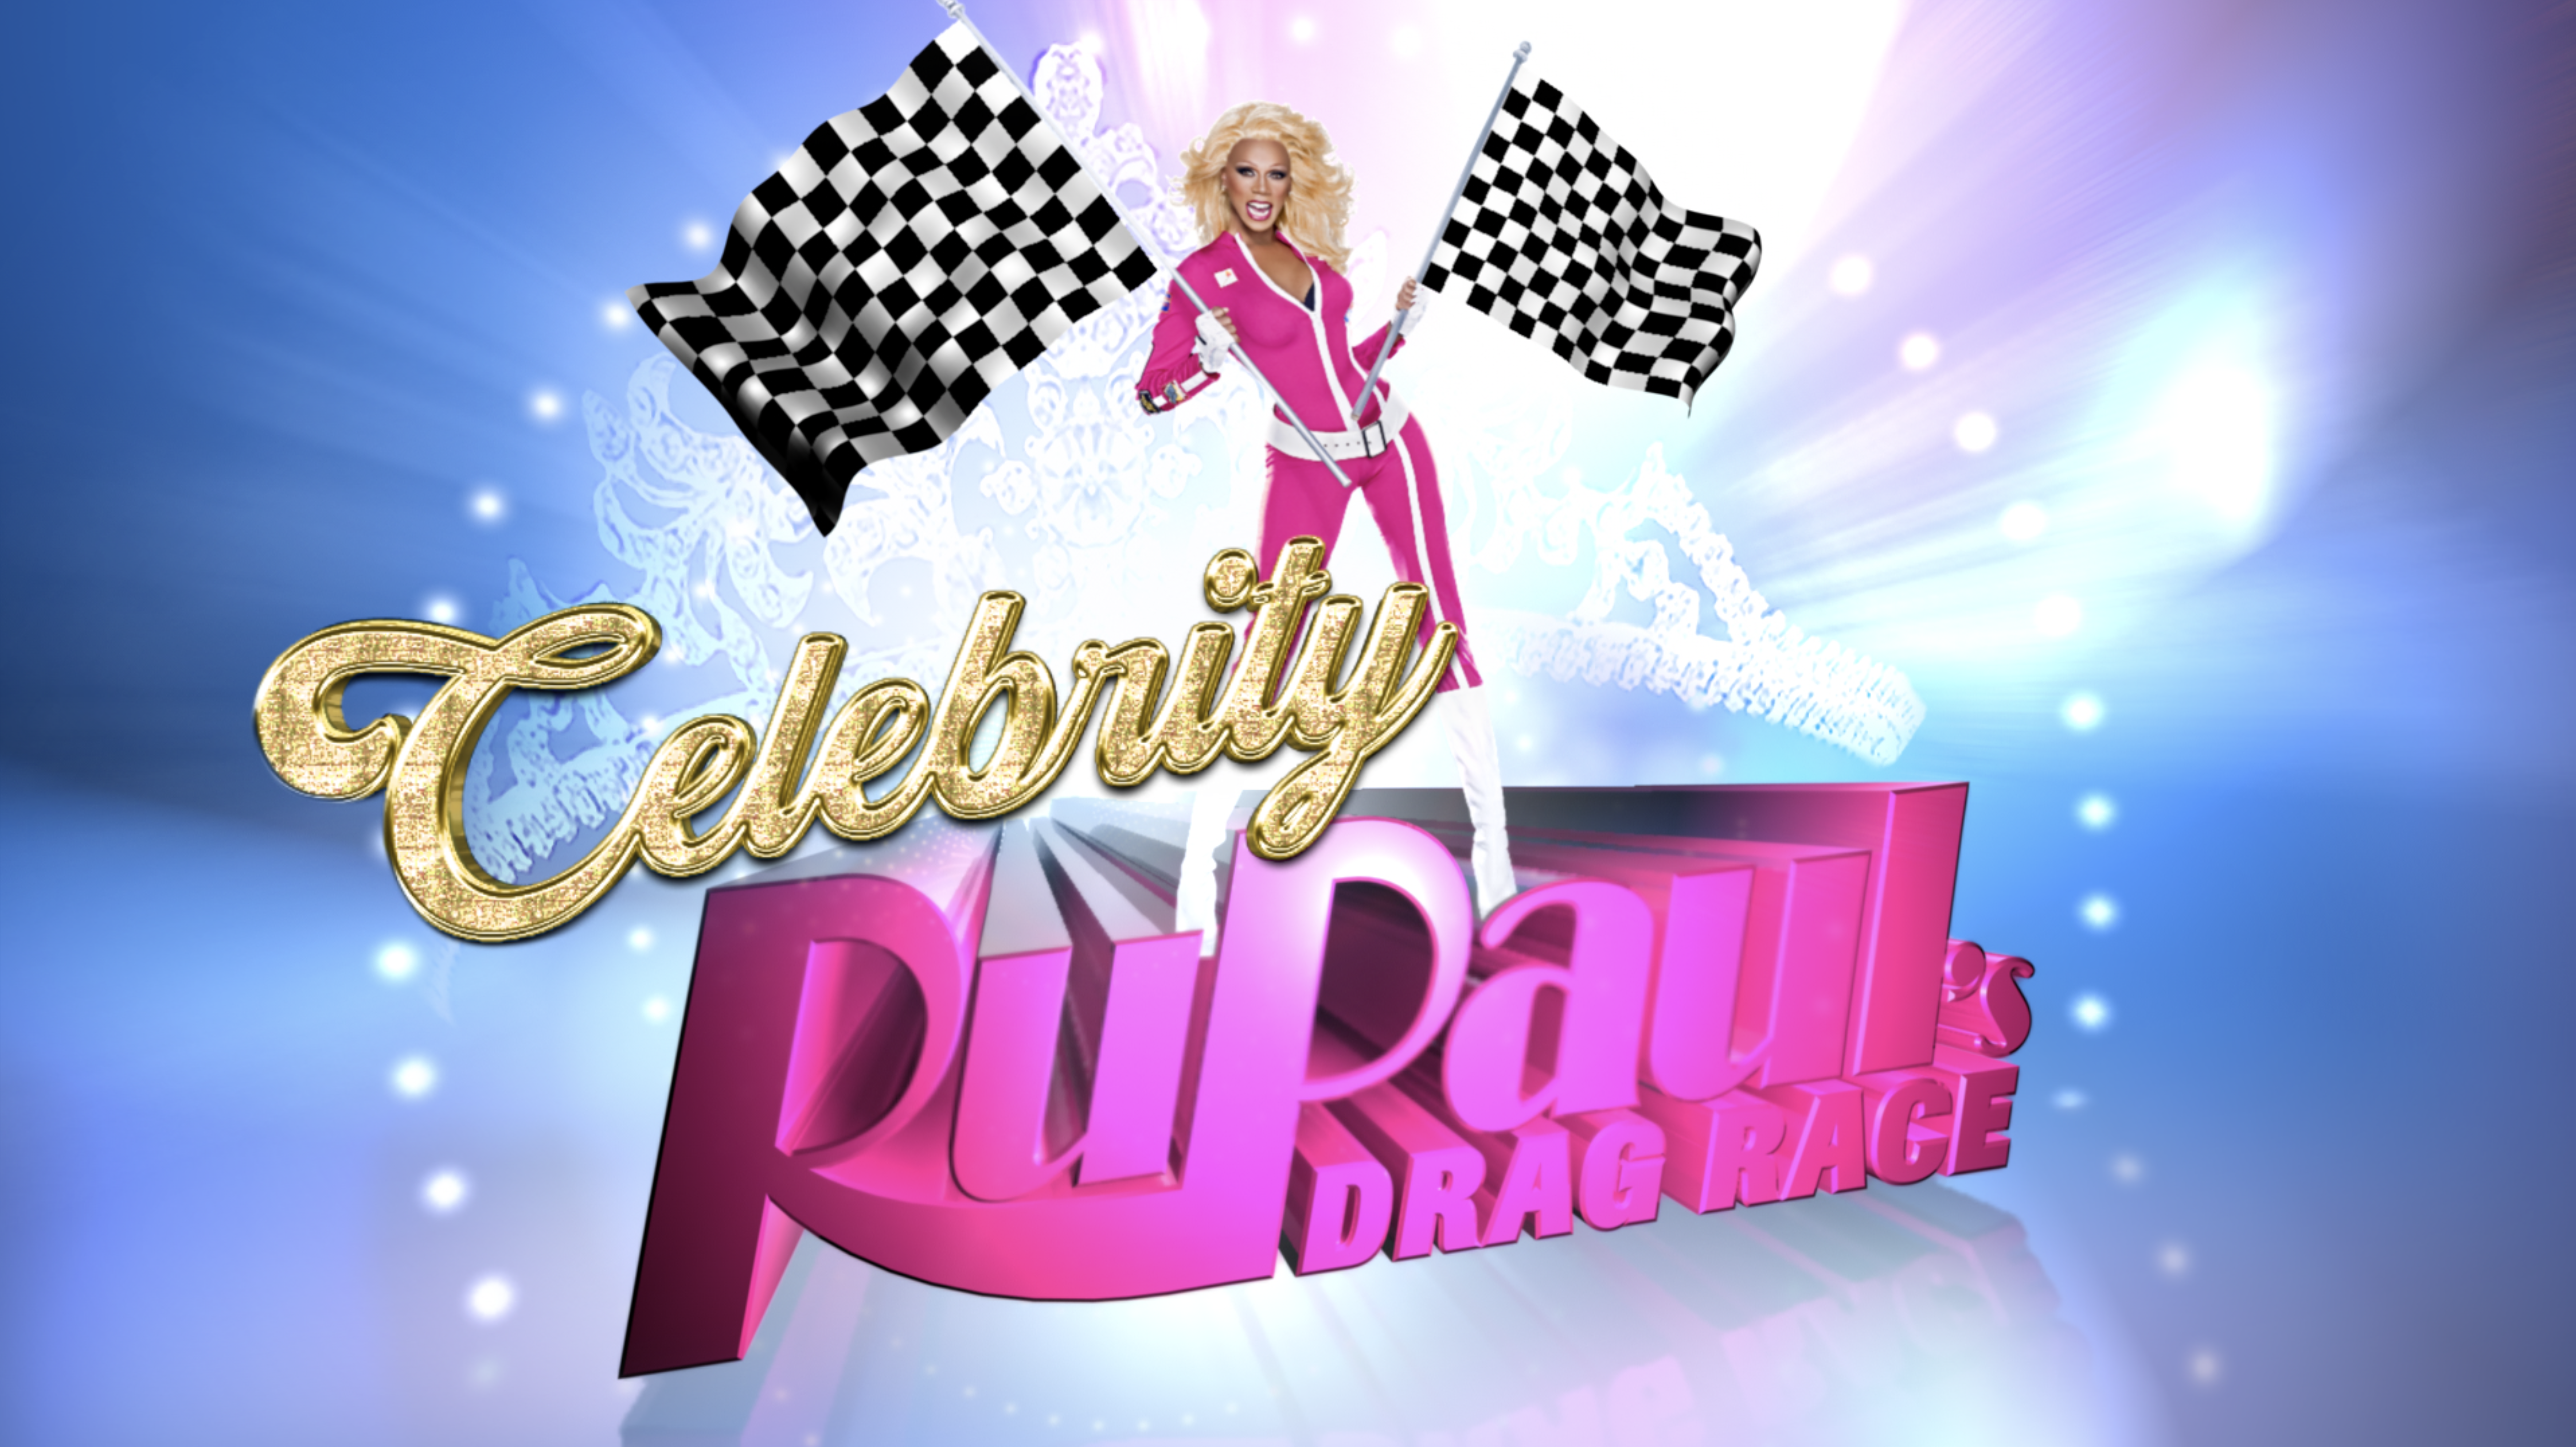 VH1 Announces 'RuPaul's Celebrity Drag Race' for 2020!   RuPaul, RuPaul's Drag Race